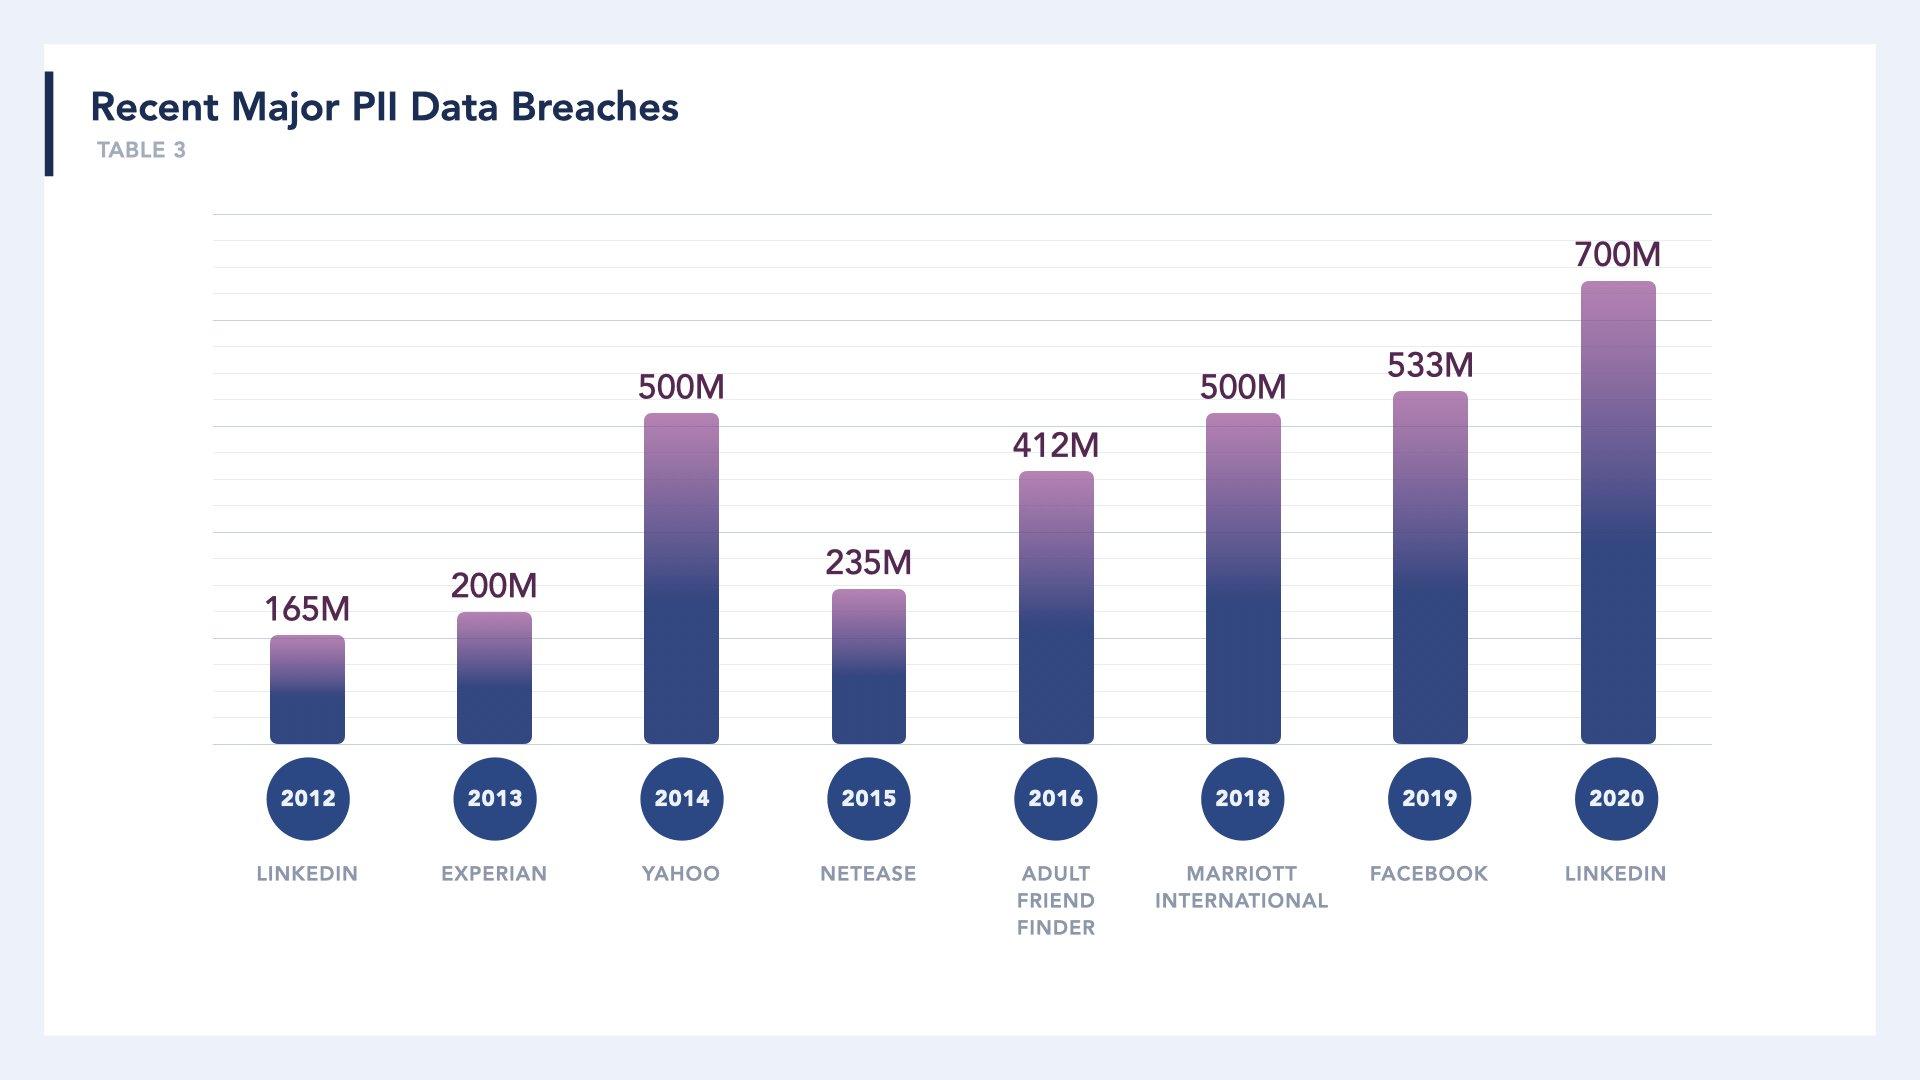 A list of companies with major data breaches. LinkedIn, Experian, Yahoo, NetEase, Adult Friend Finder, Marriott International, Facebook, and LinkedIn